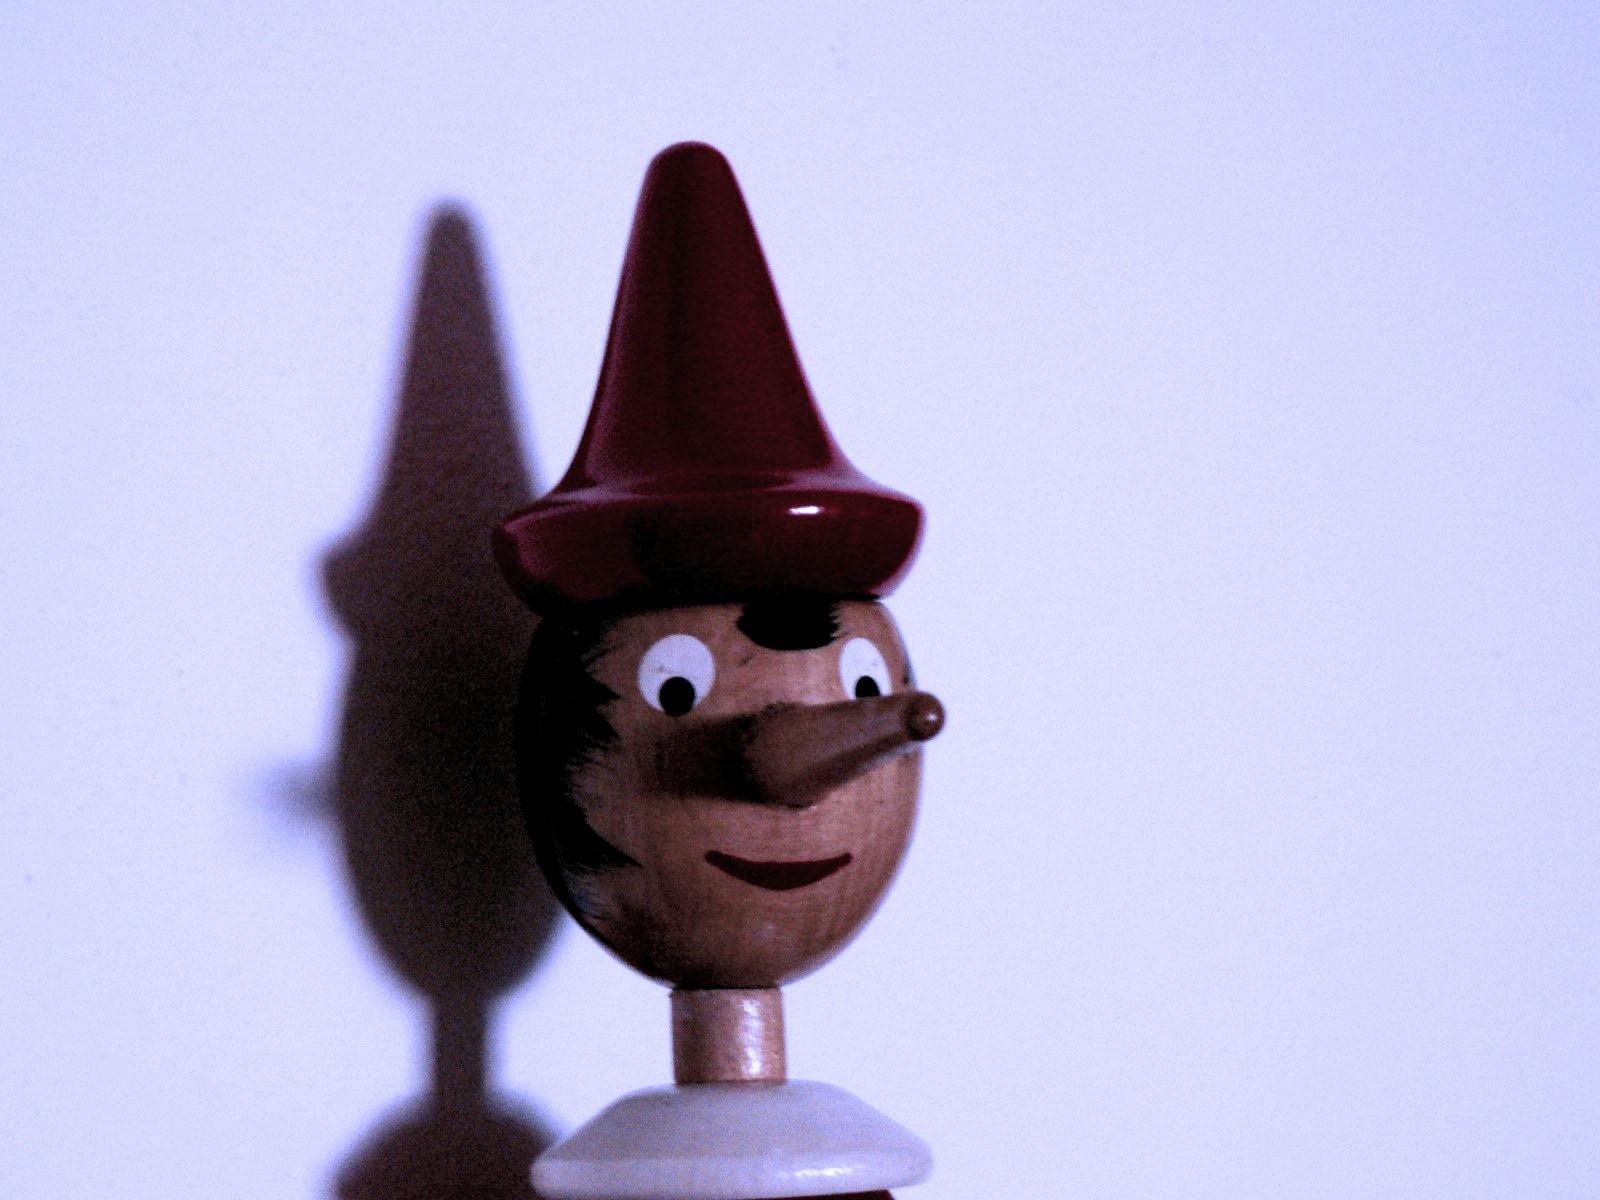 Pinocchio by Daniele Manca